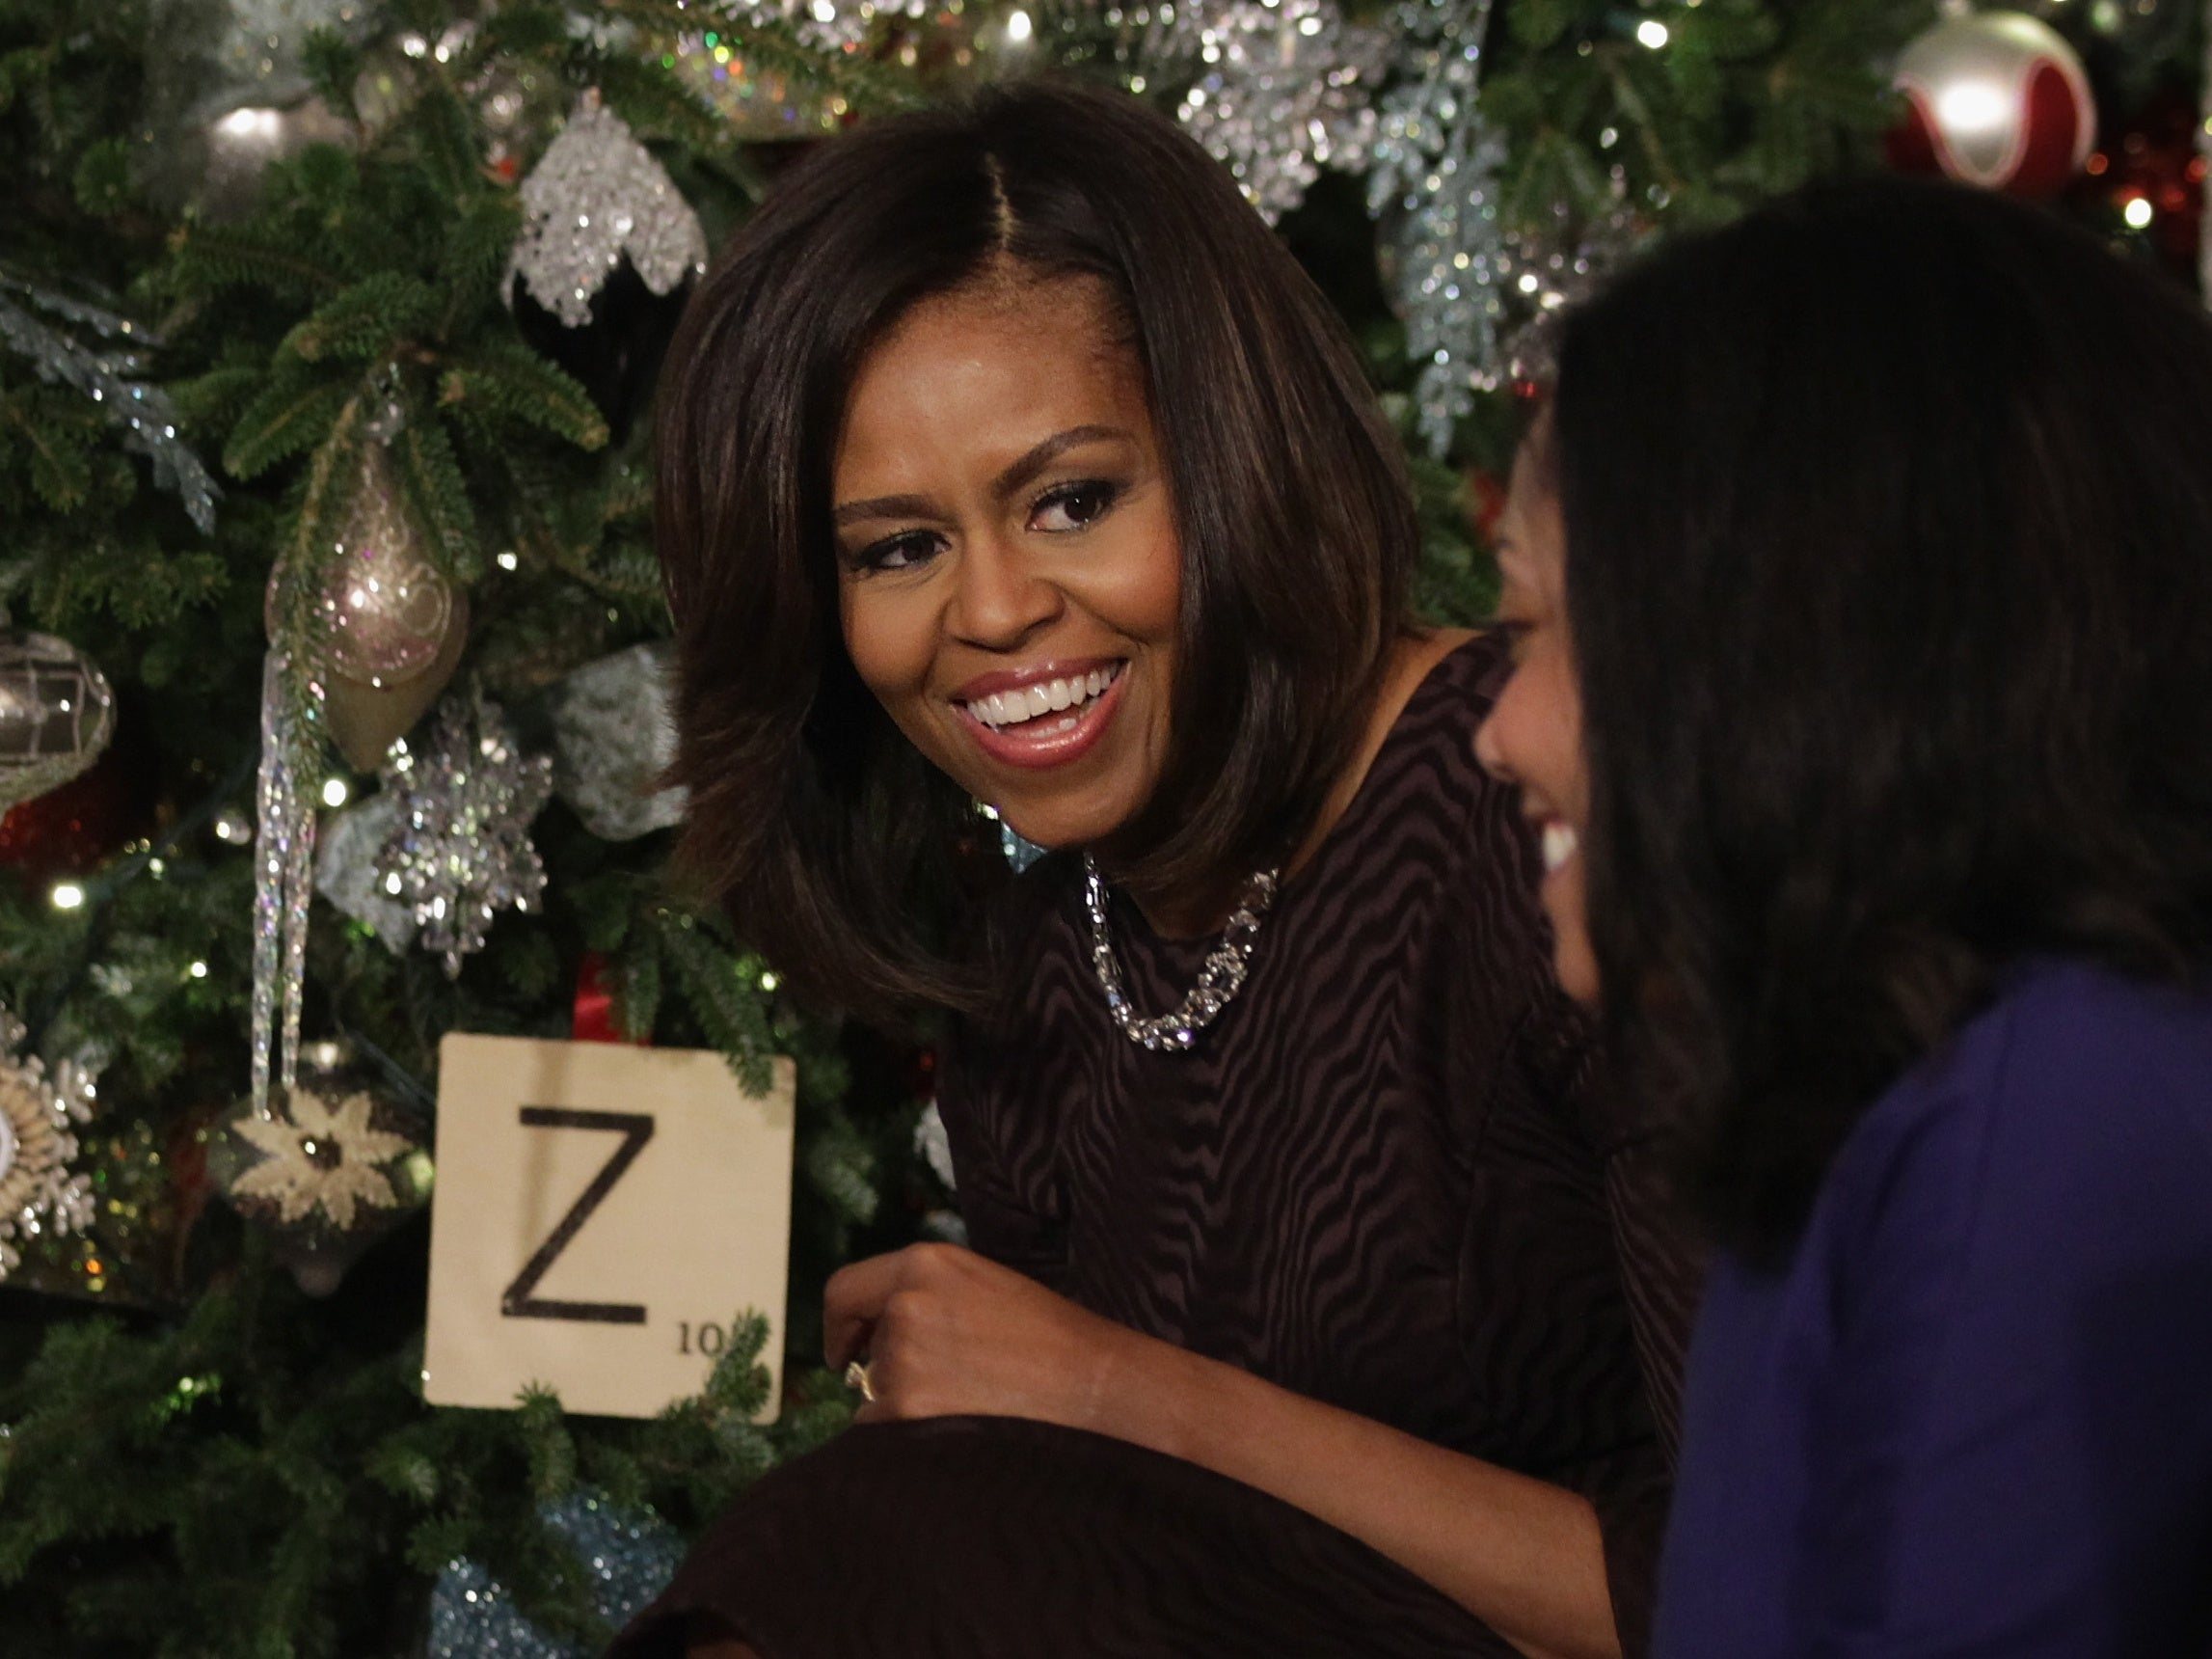 Barack Obama Recalls Bringing Holiday Magic To All At The White House